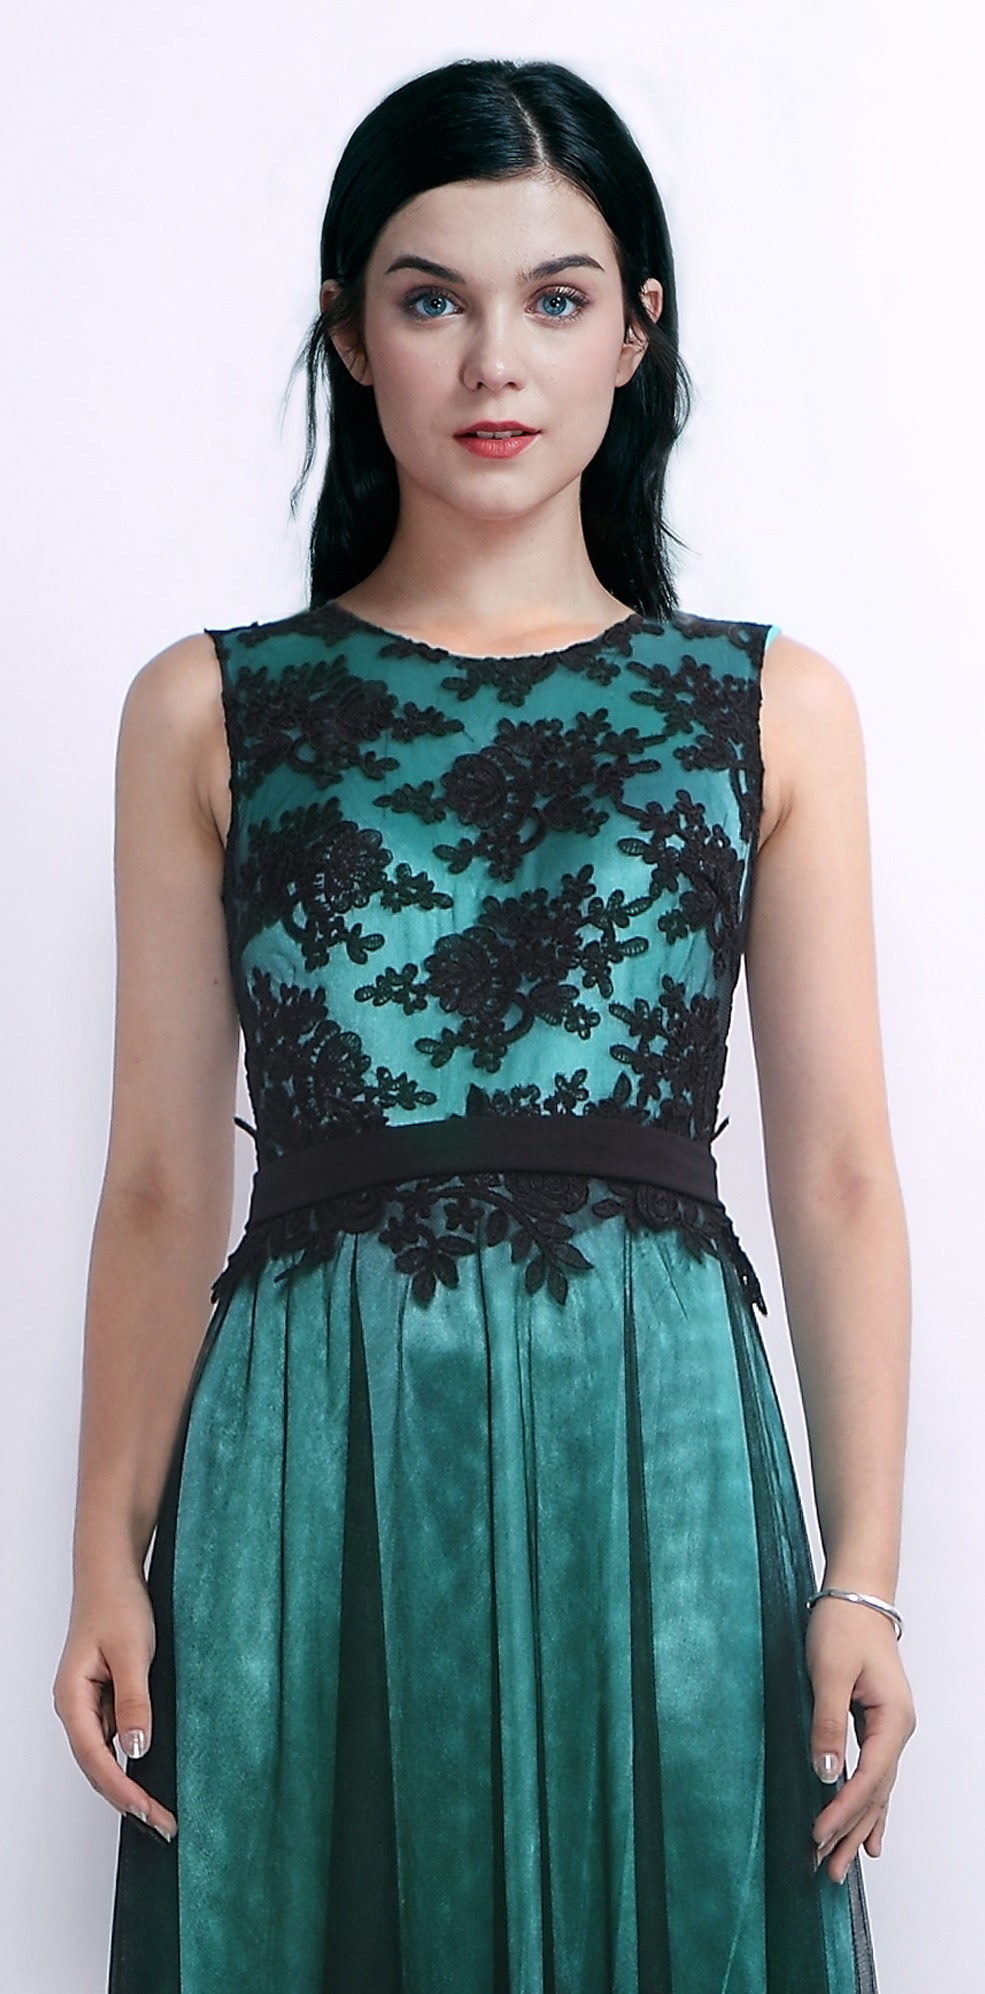 70acfff0f47 ... zelené Plesové šaty Sladké drievko